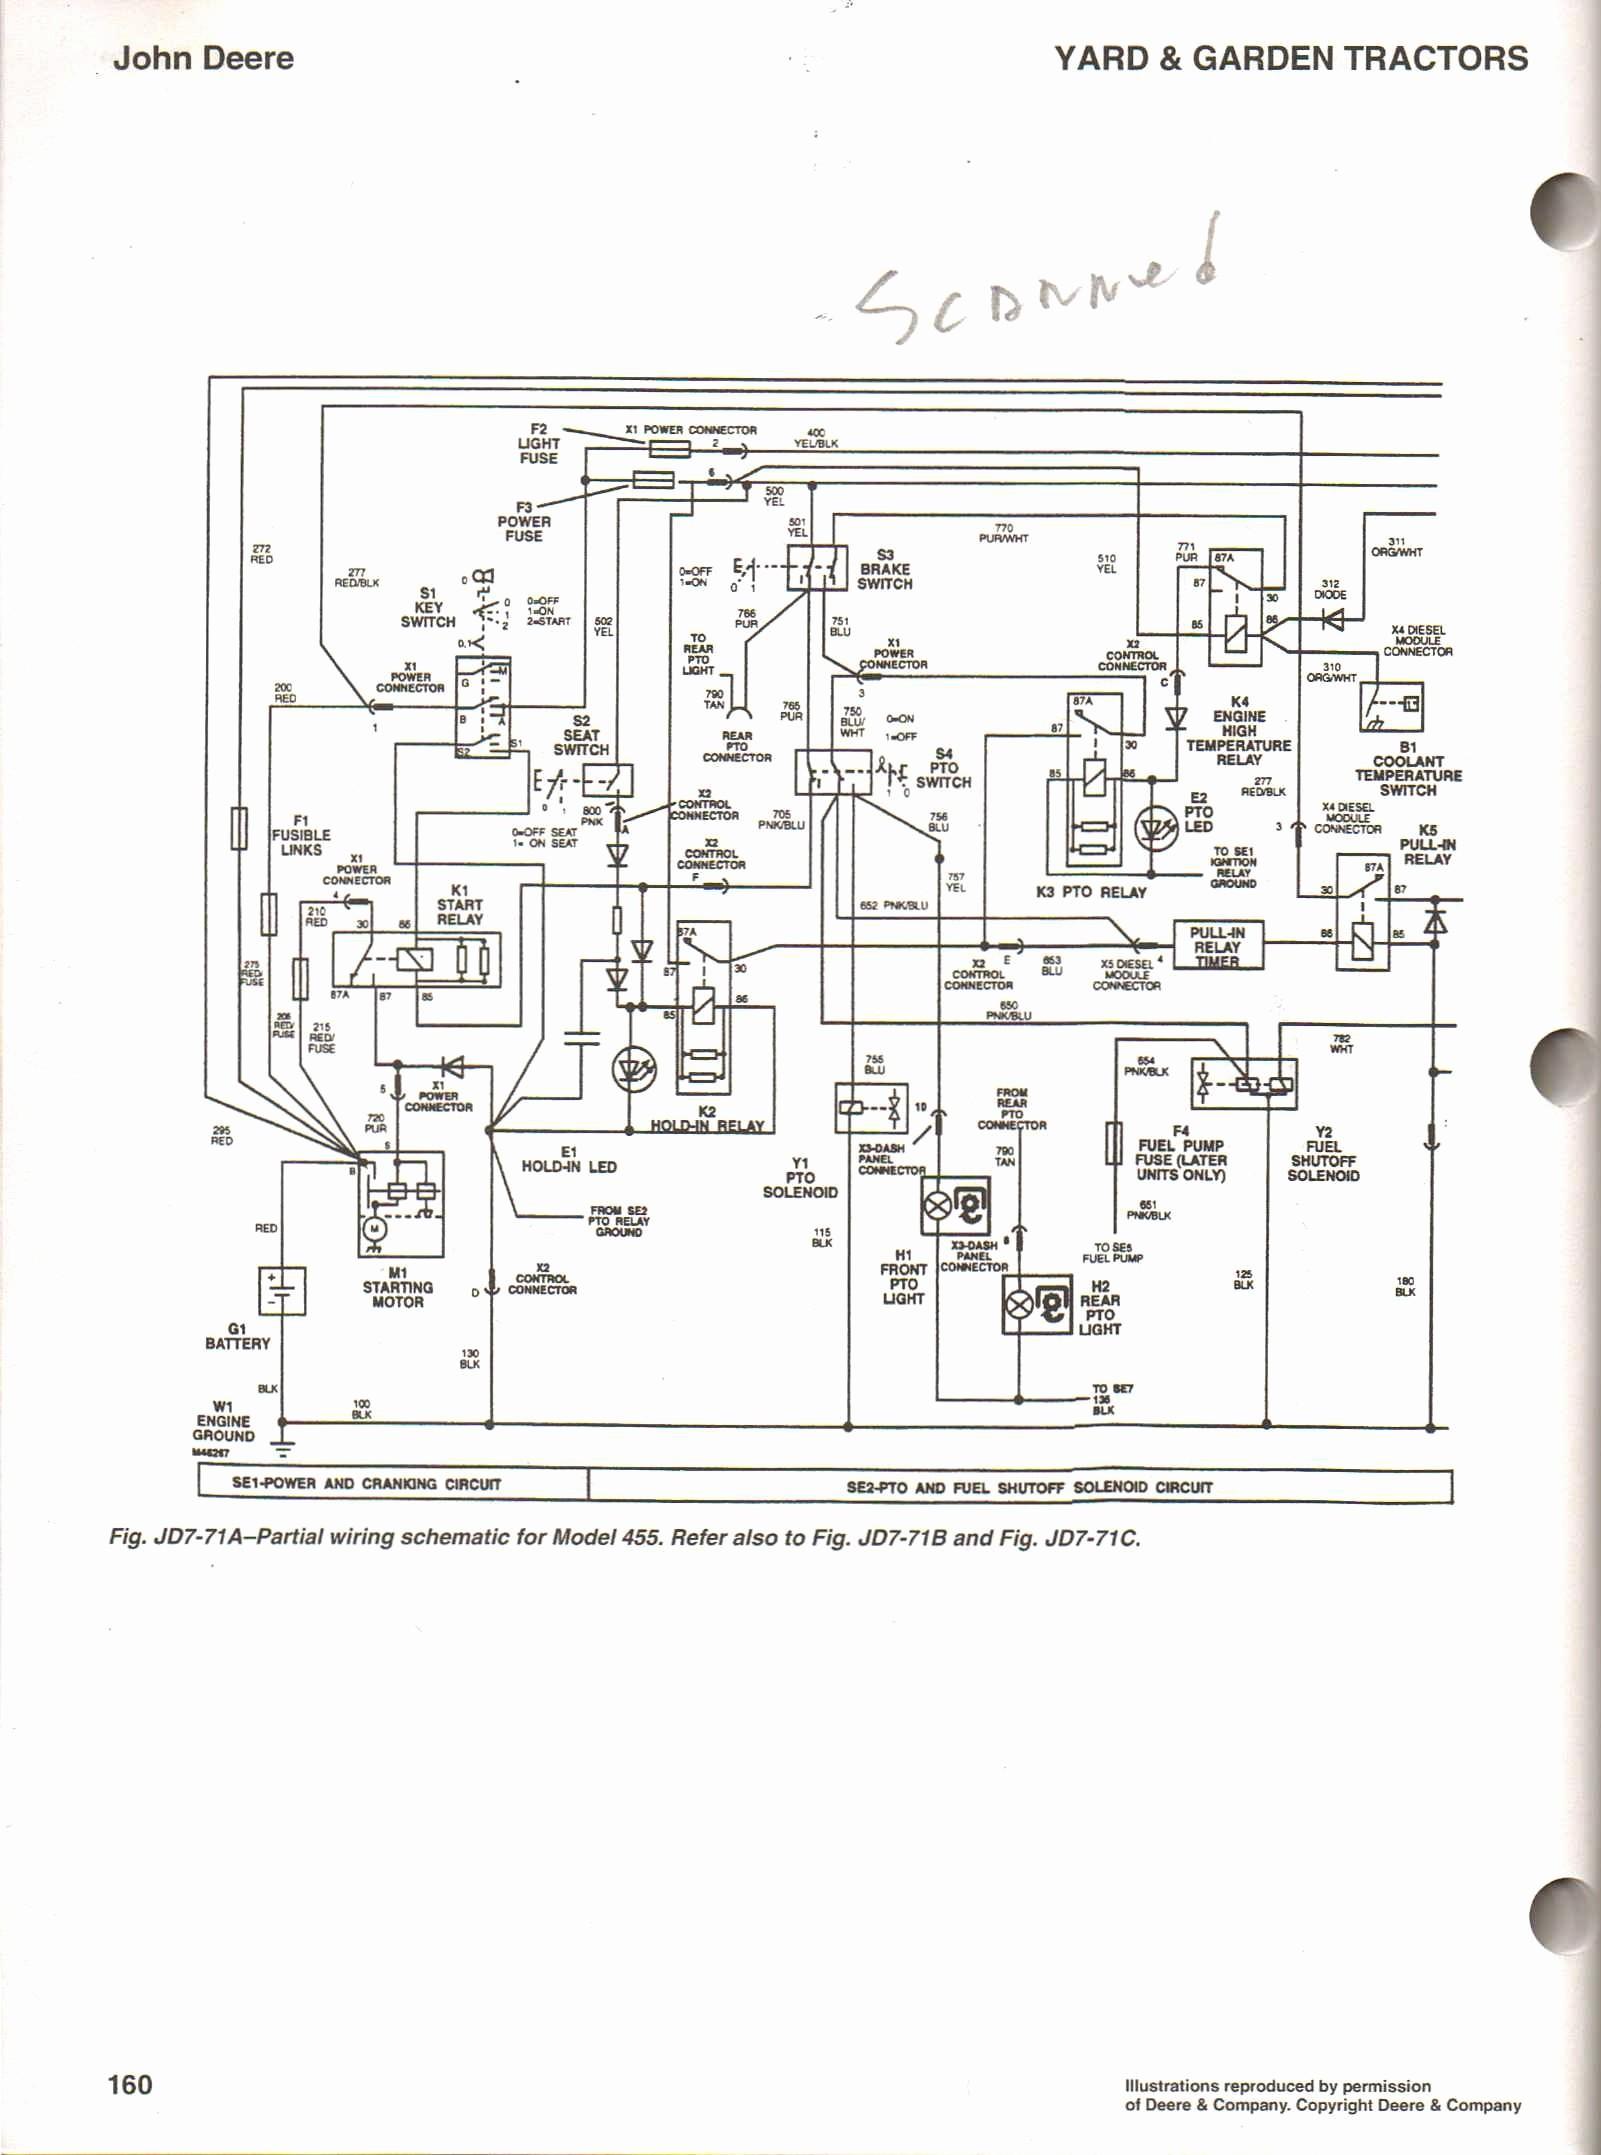 automotive diagrams archives automotive wiring diagrams